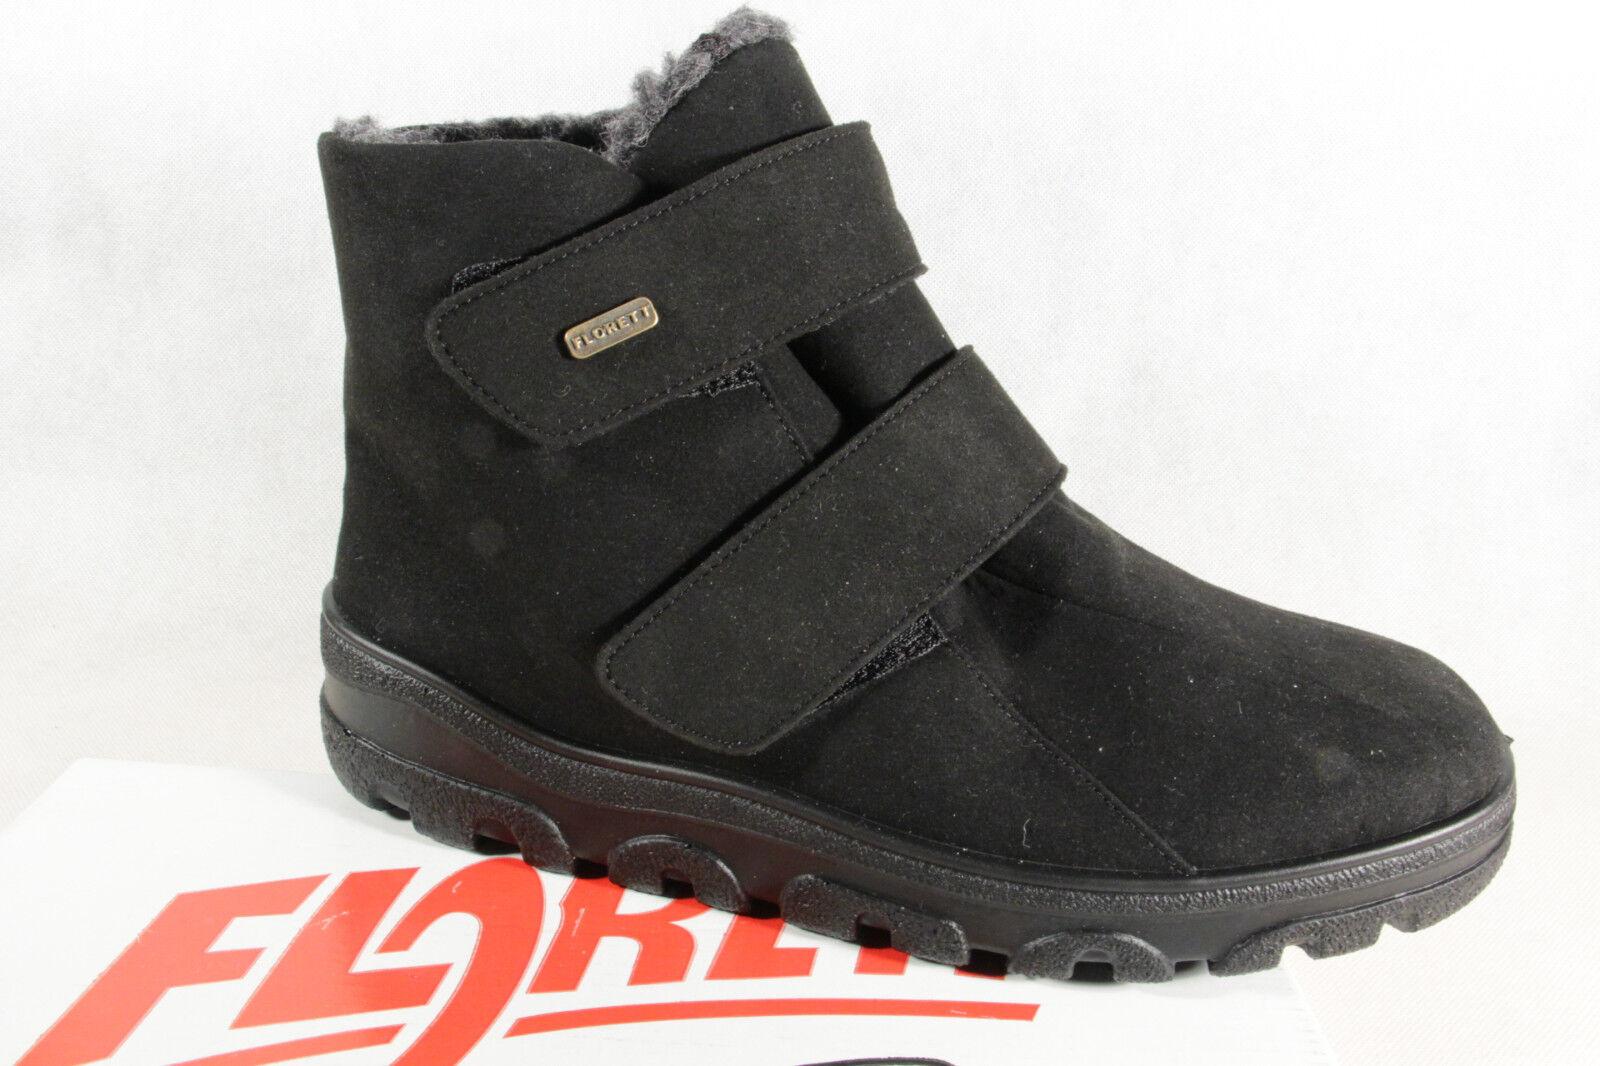 Florett Men's Boots Ankle Boots Winter Boots Tex New